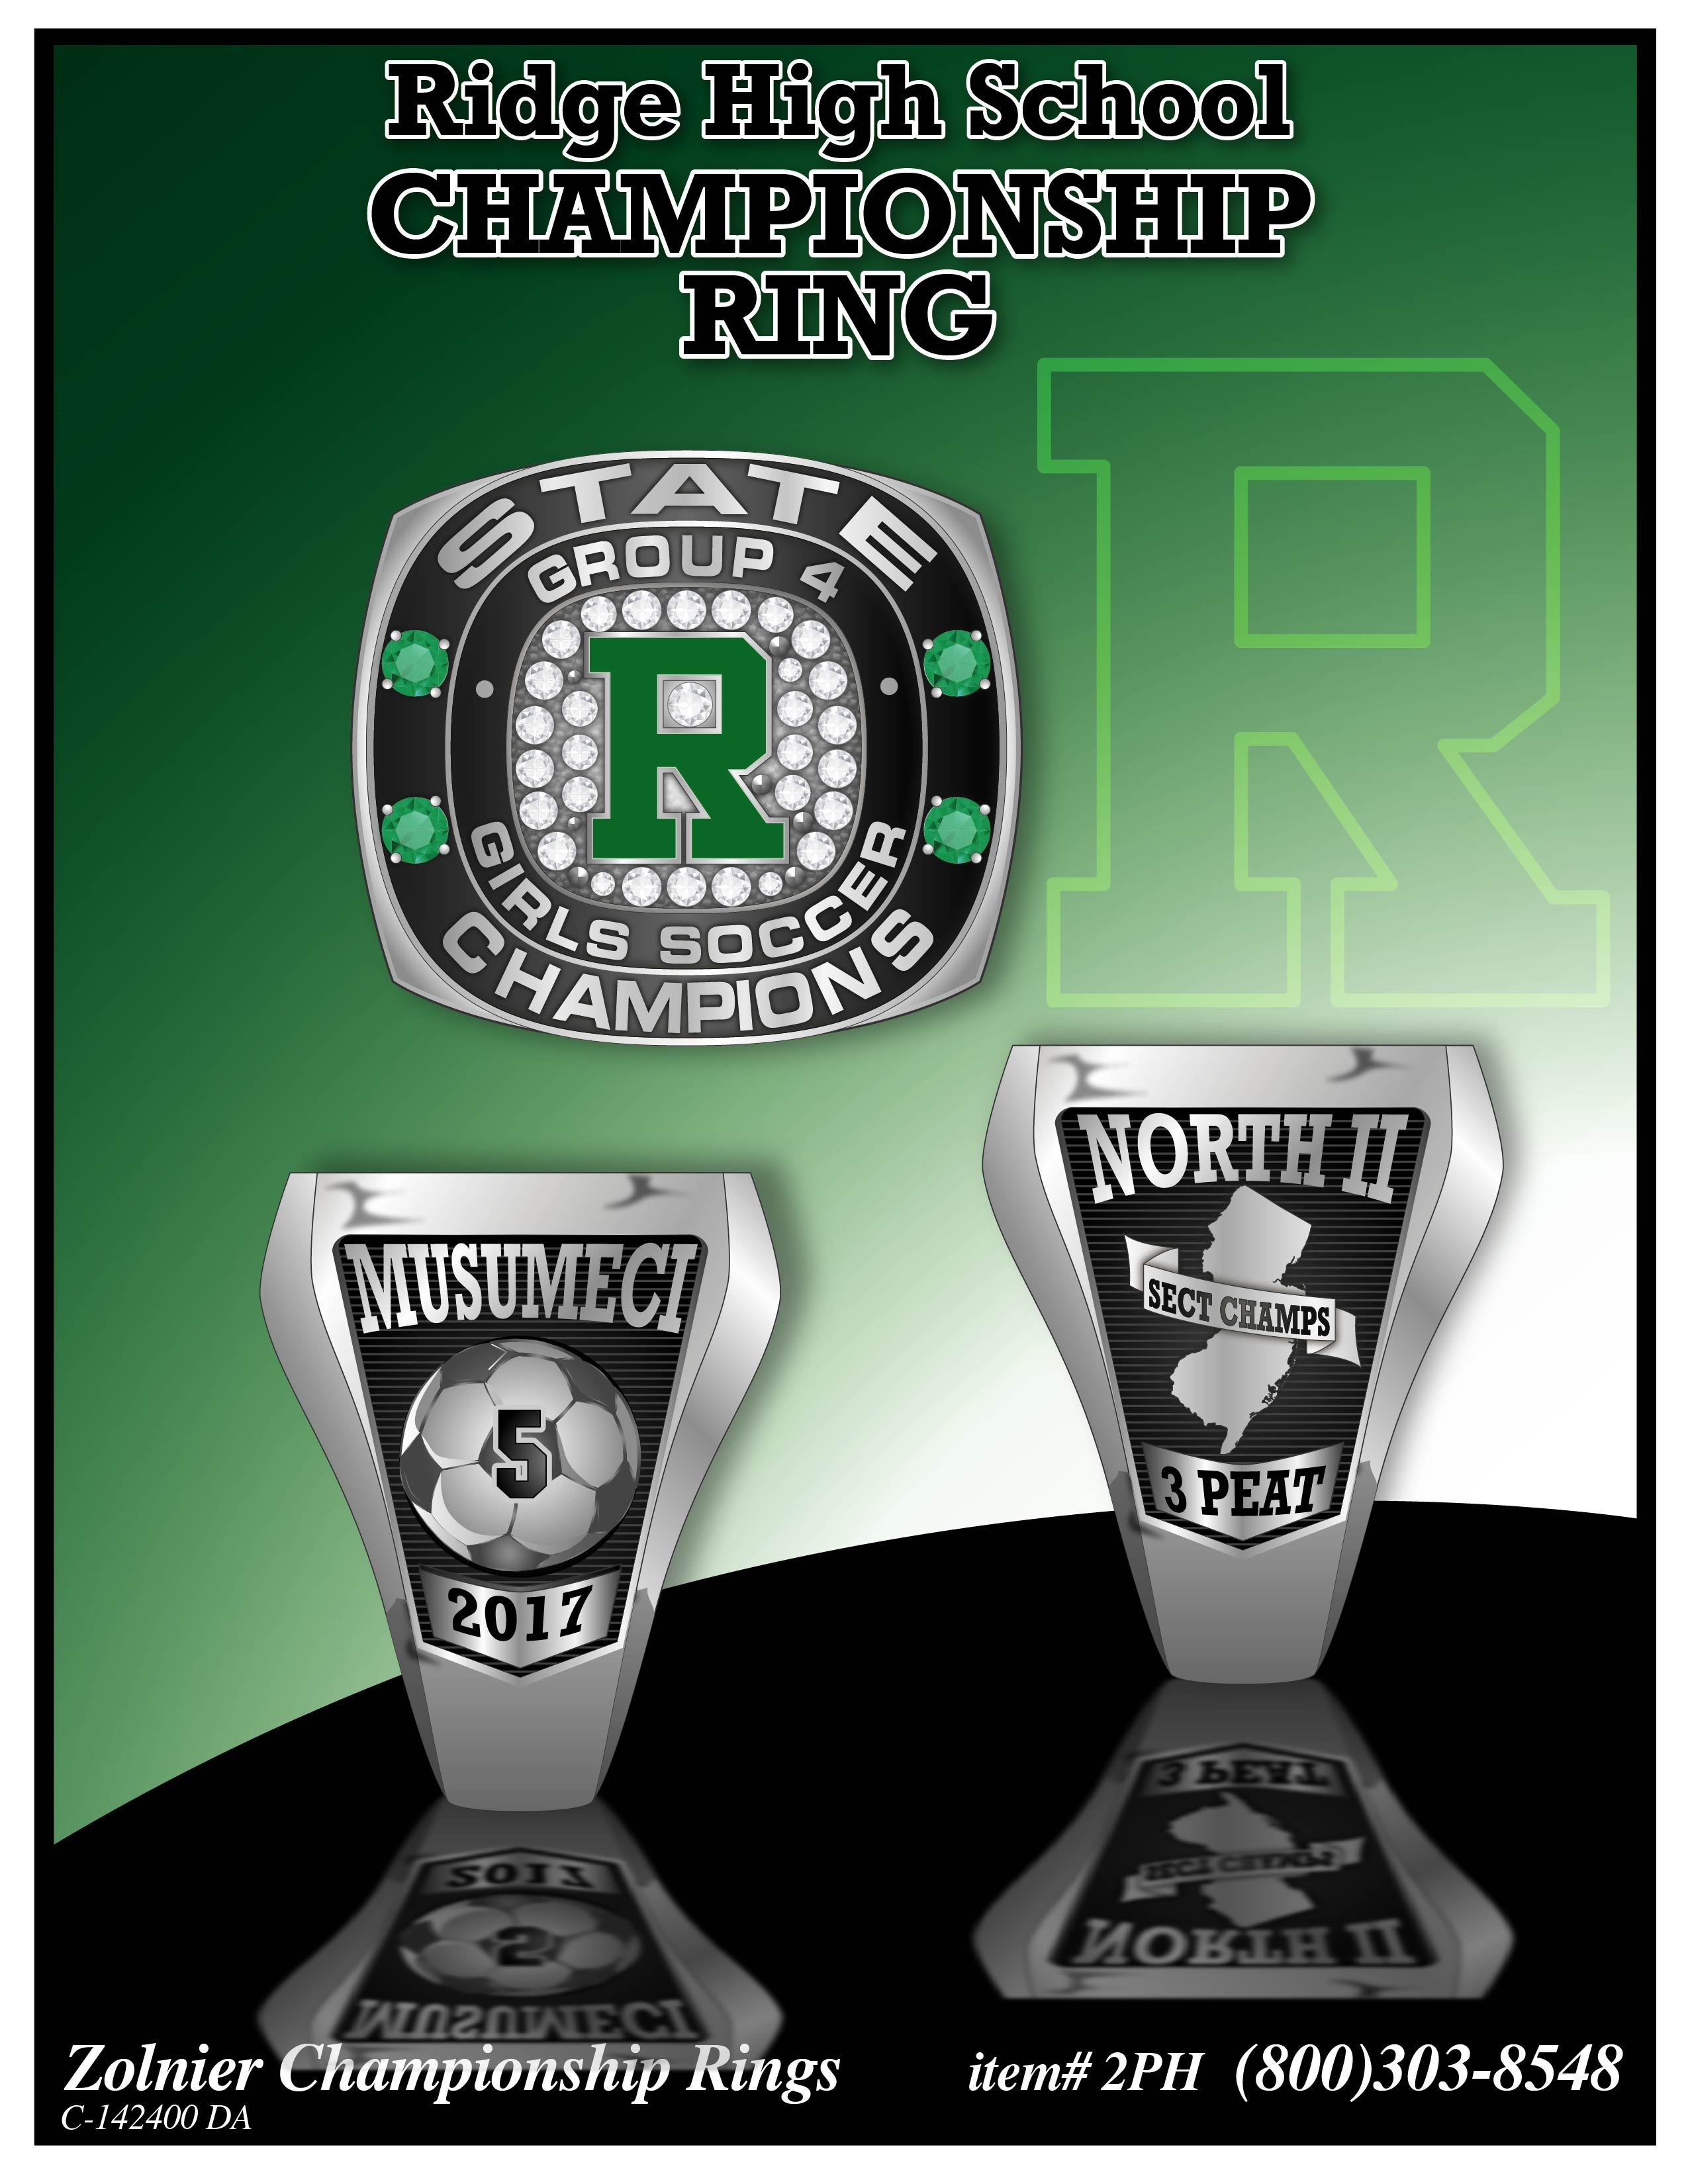 C-142400 Ridge HD Girls Soccer Champ Ring